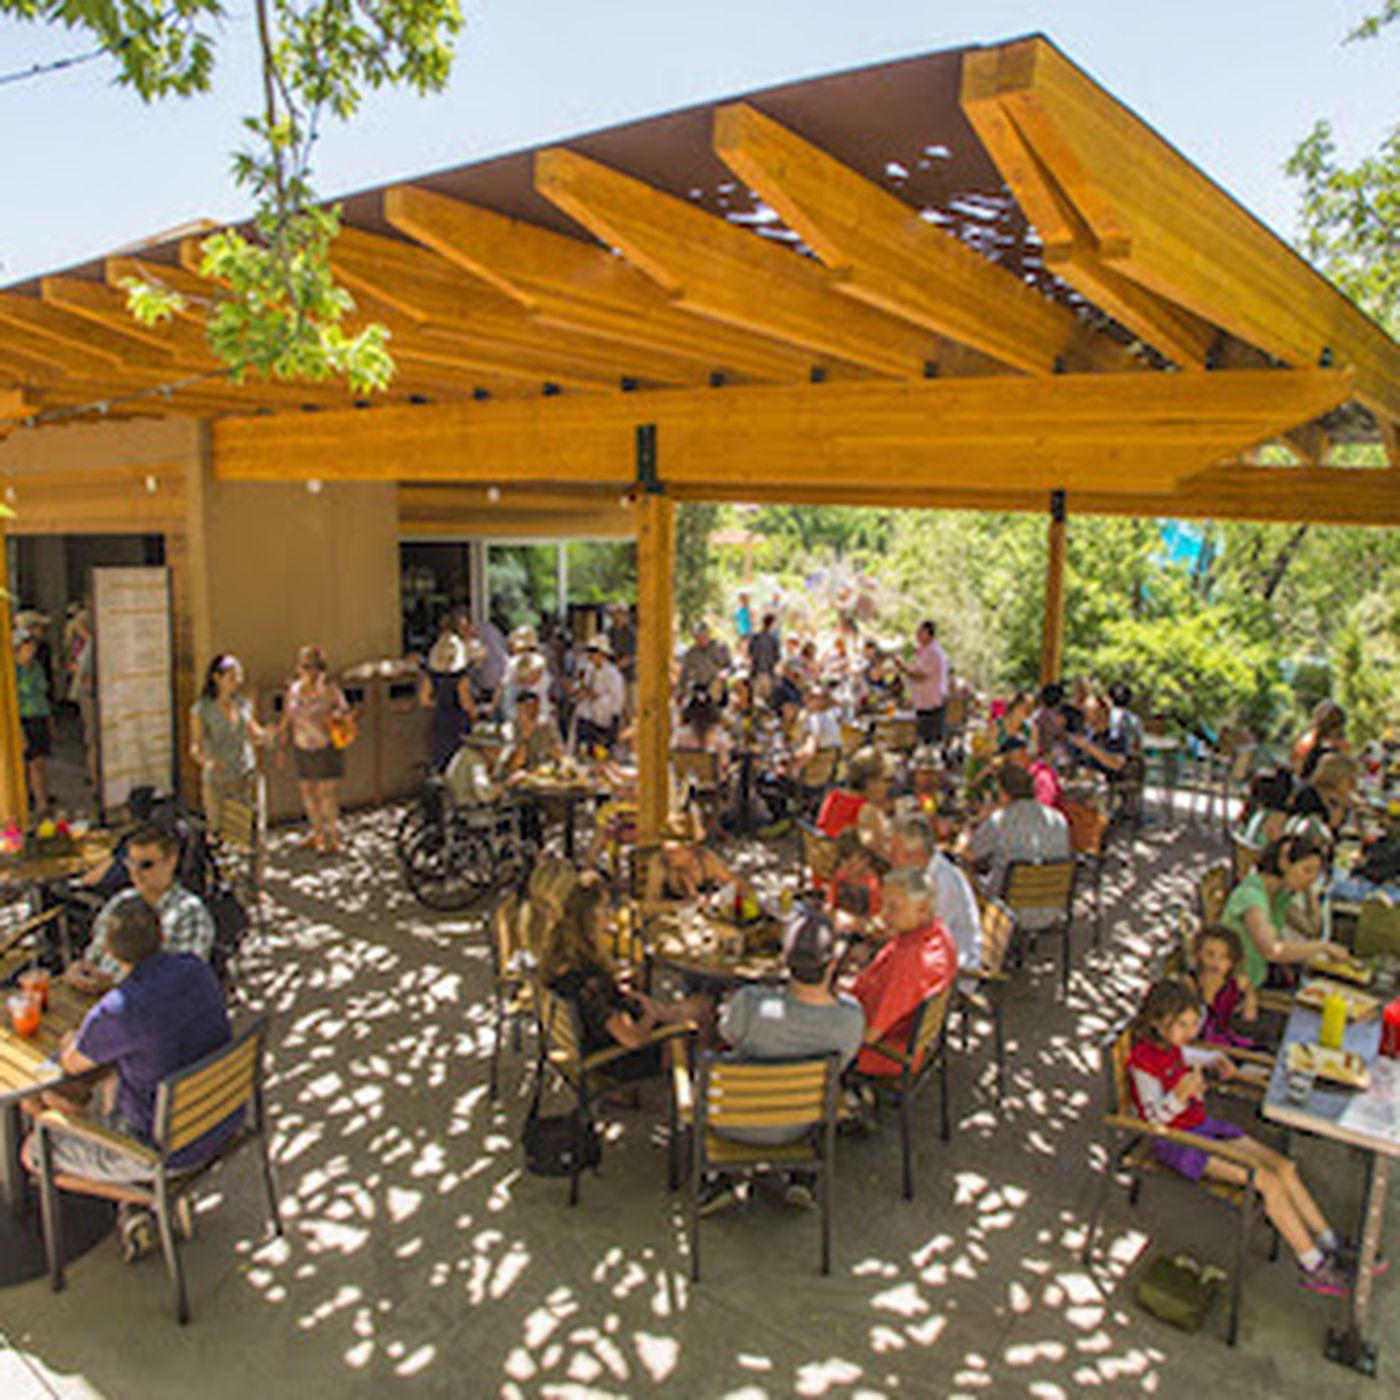 Denver Botanic Gardens Unveils The Hive Garden Bistro - Eater Denver